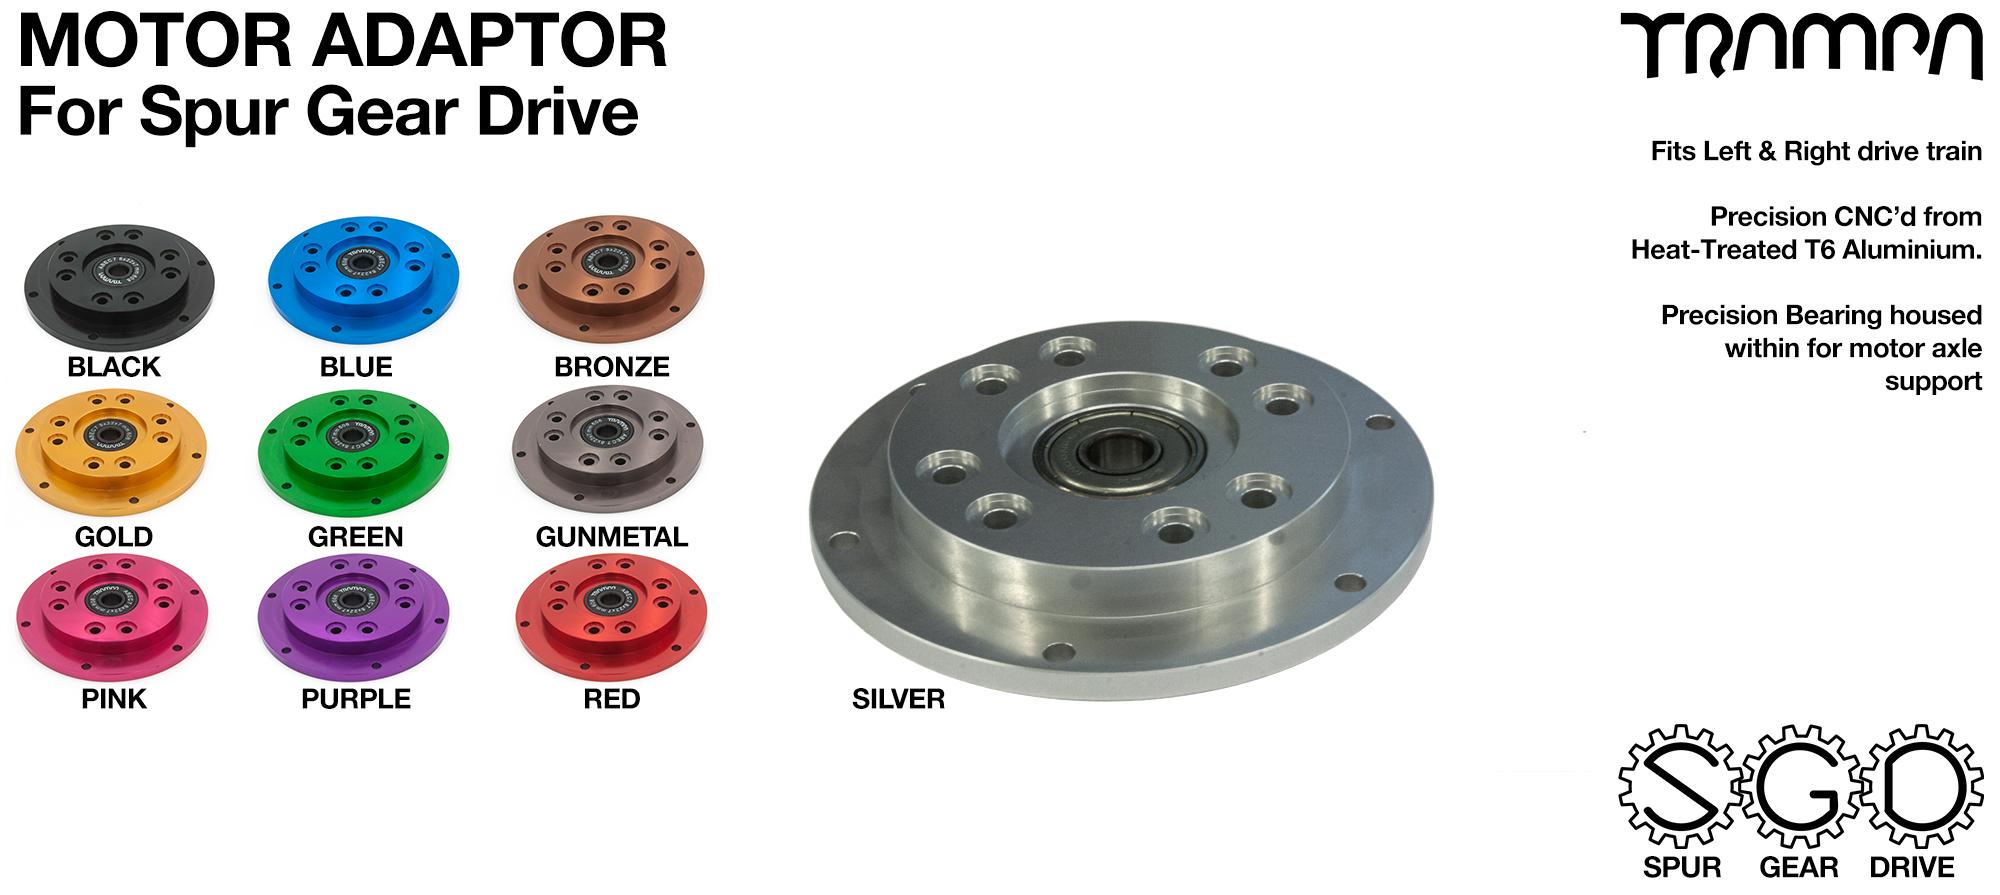 MkII Spur Gear Drive Motor Adaptor